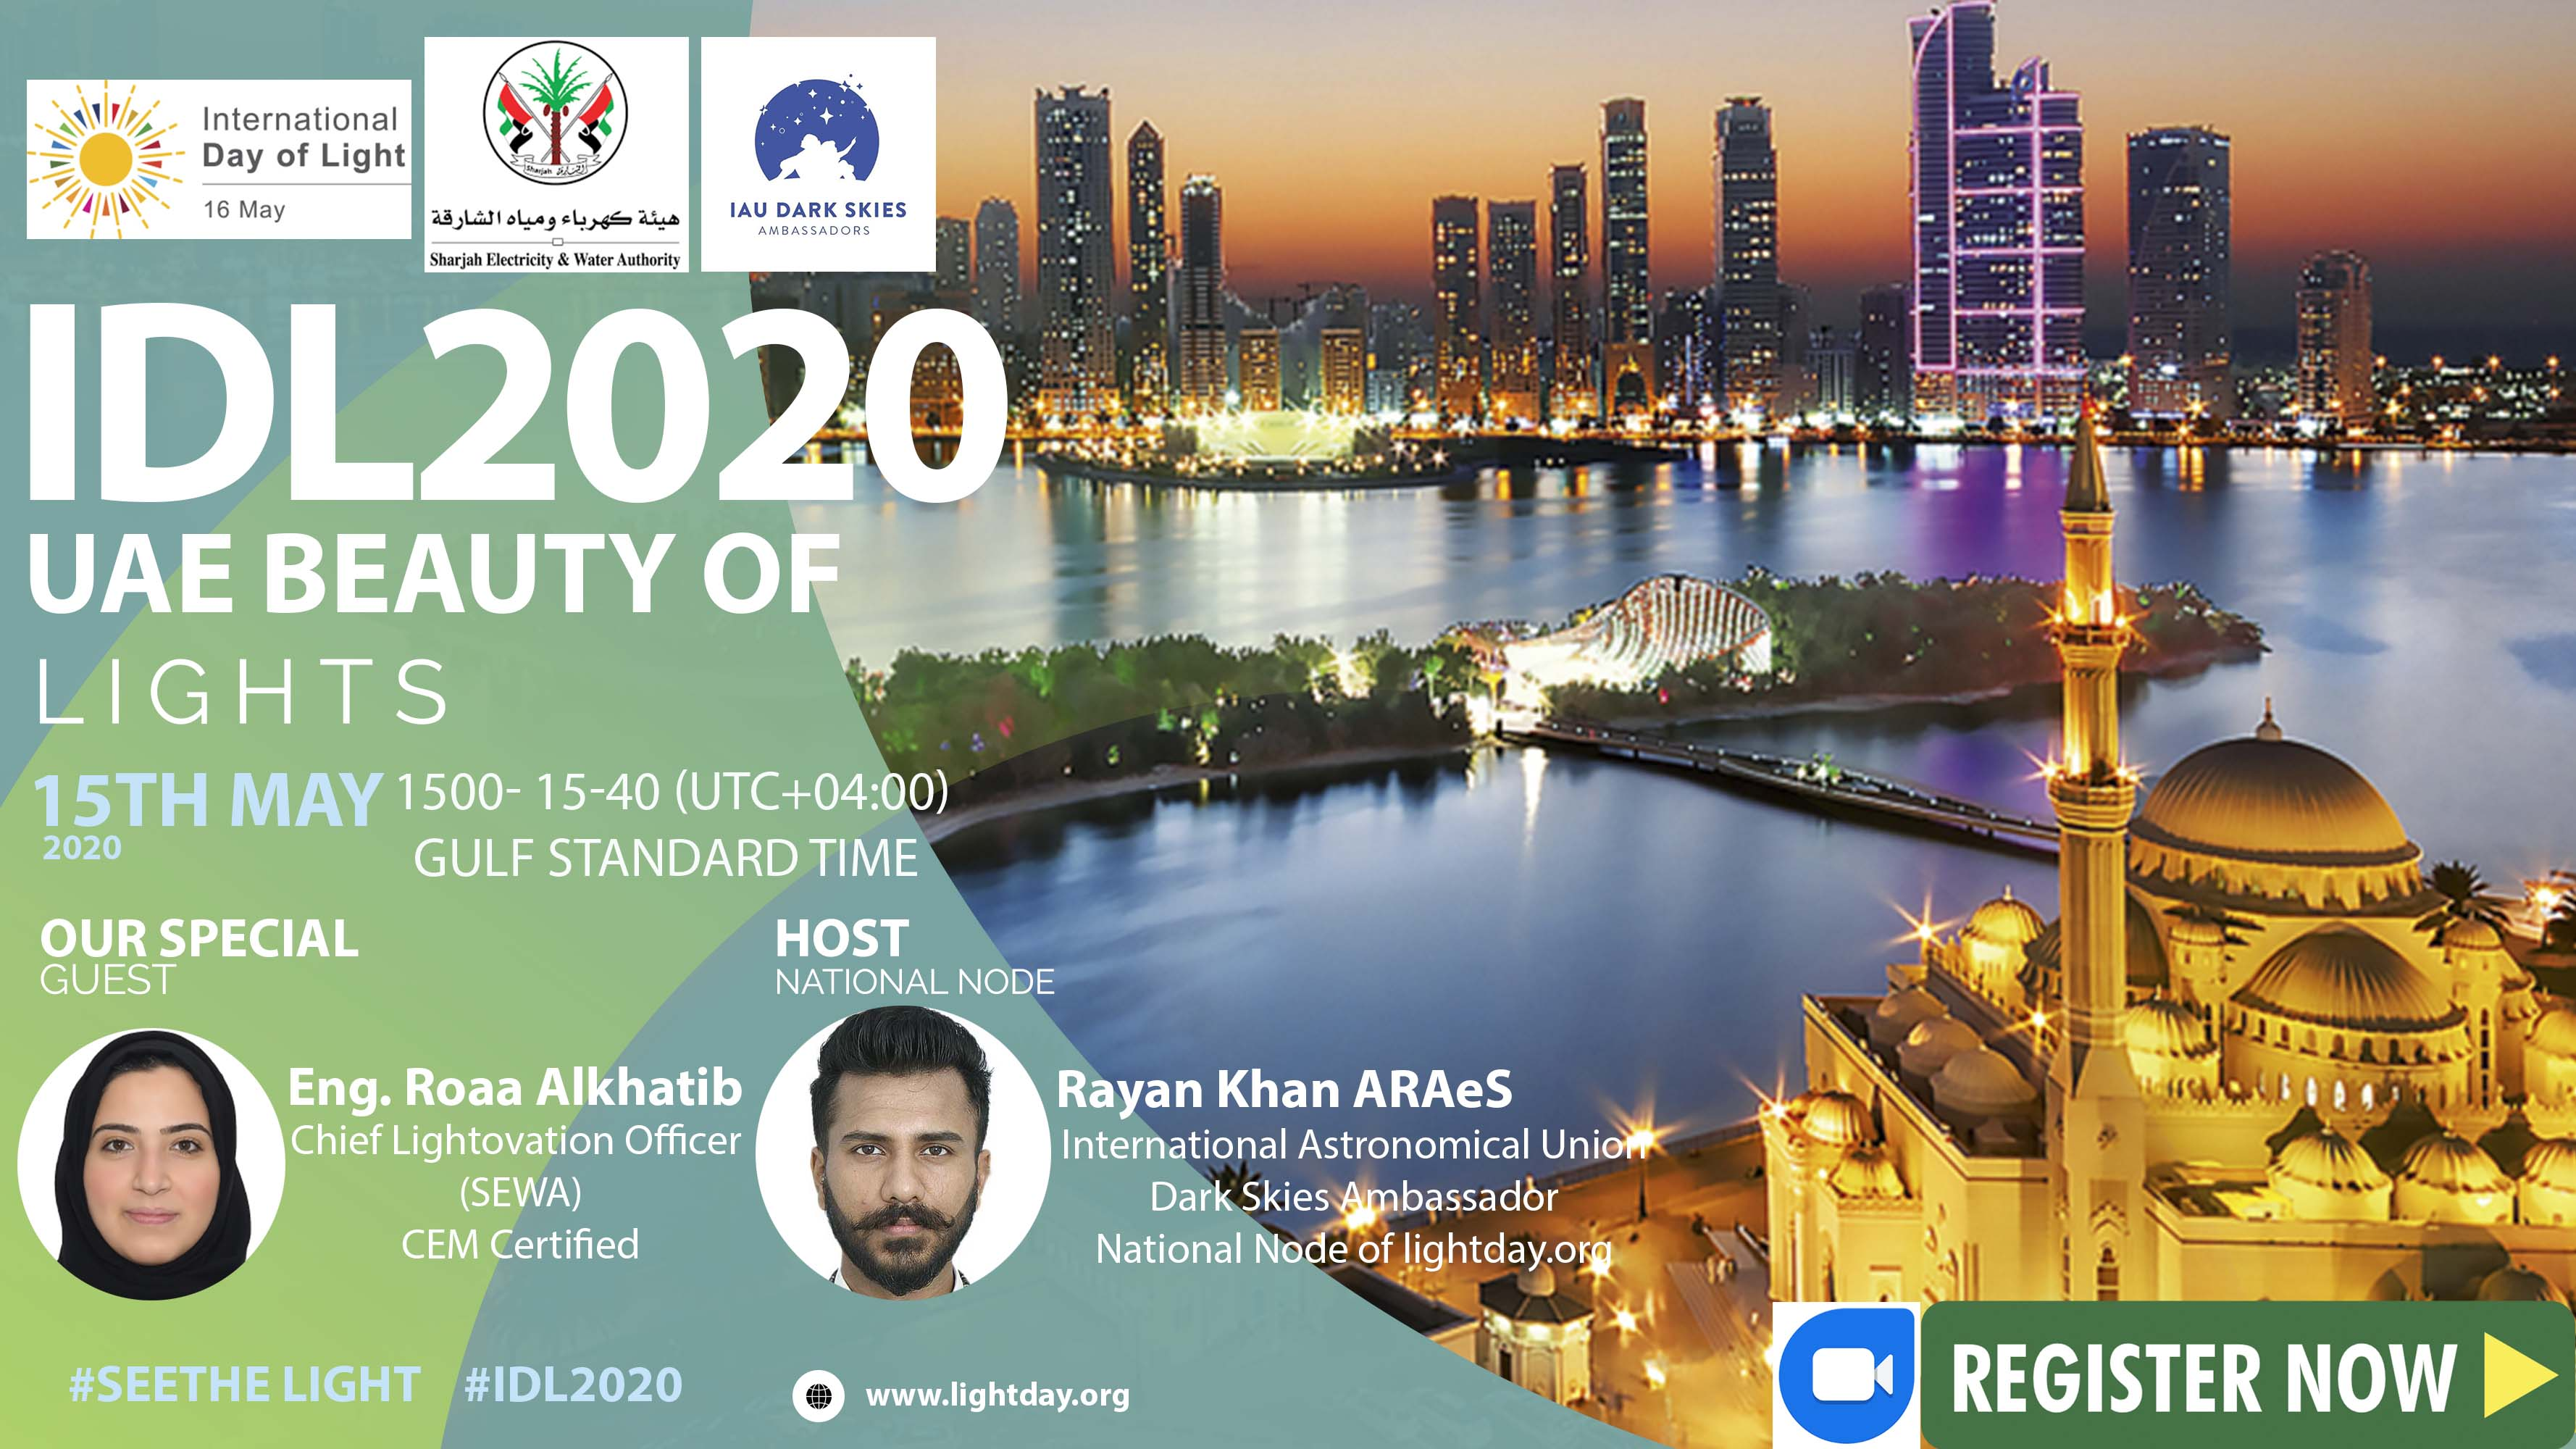 IDL2020 UAE BEAUTY OF LIGHTS